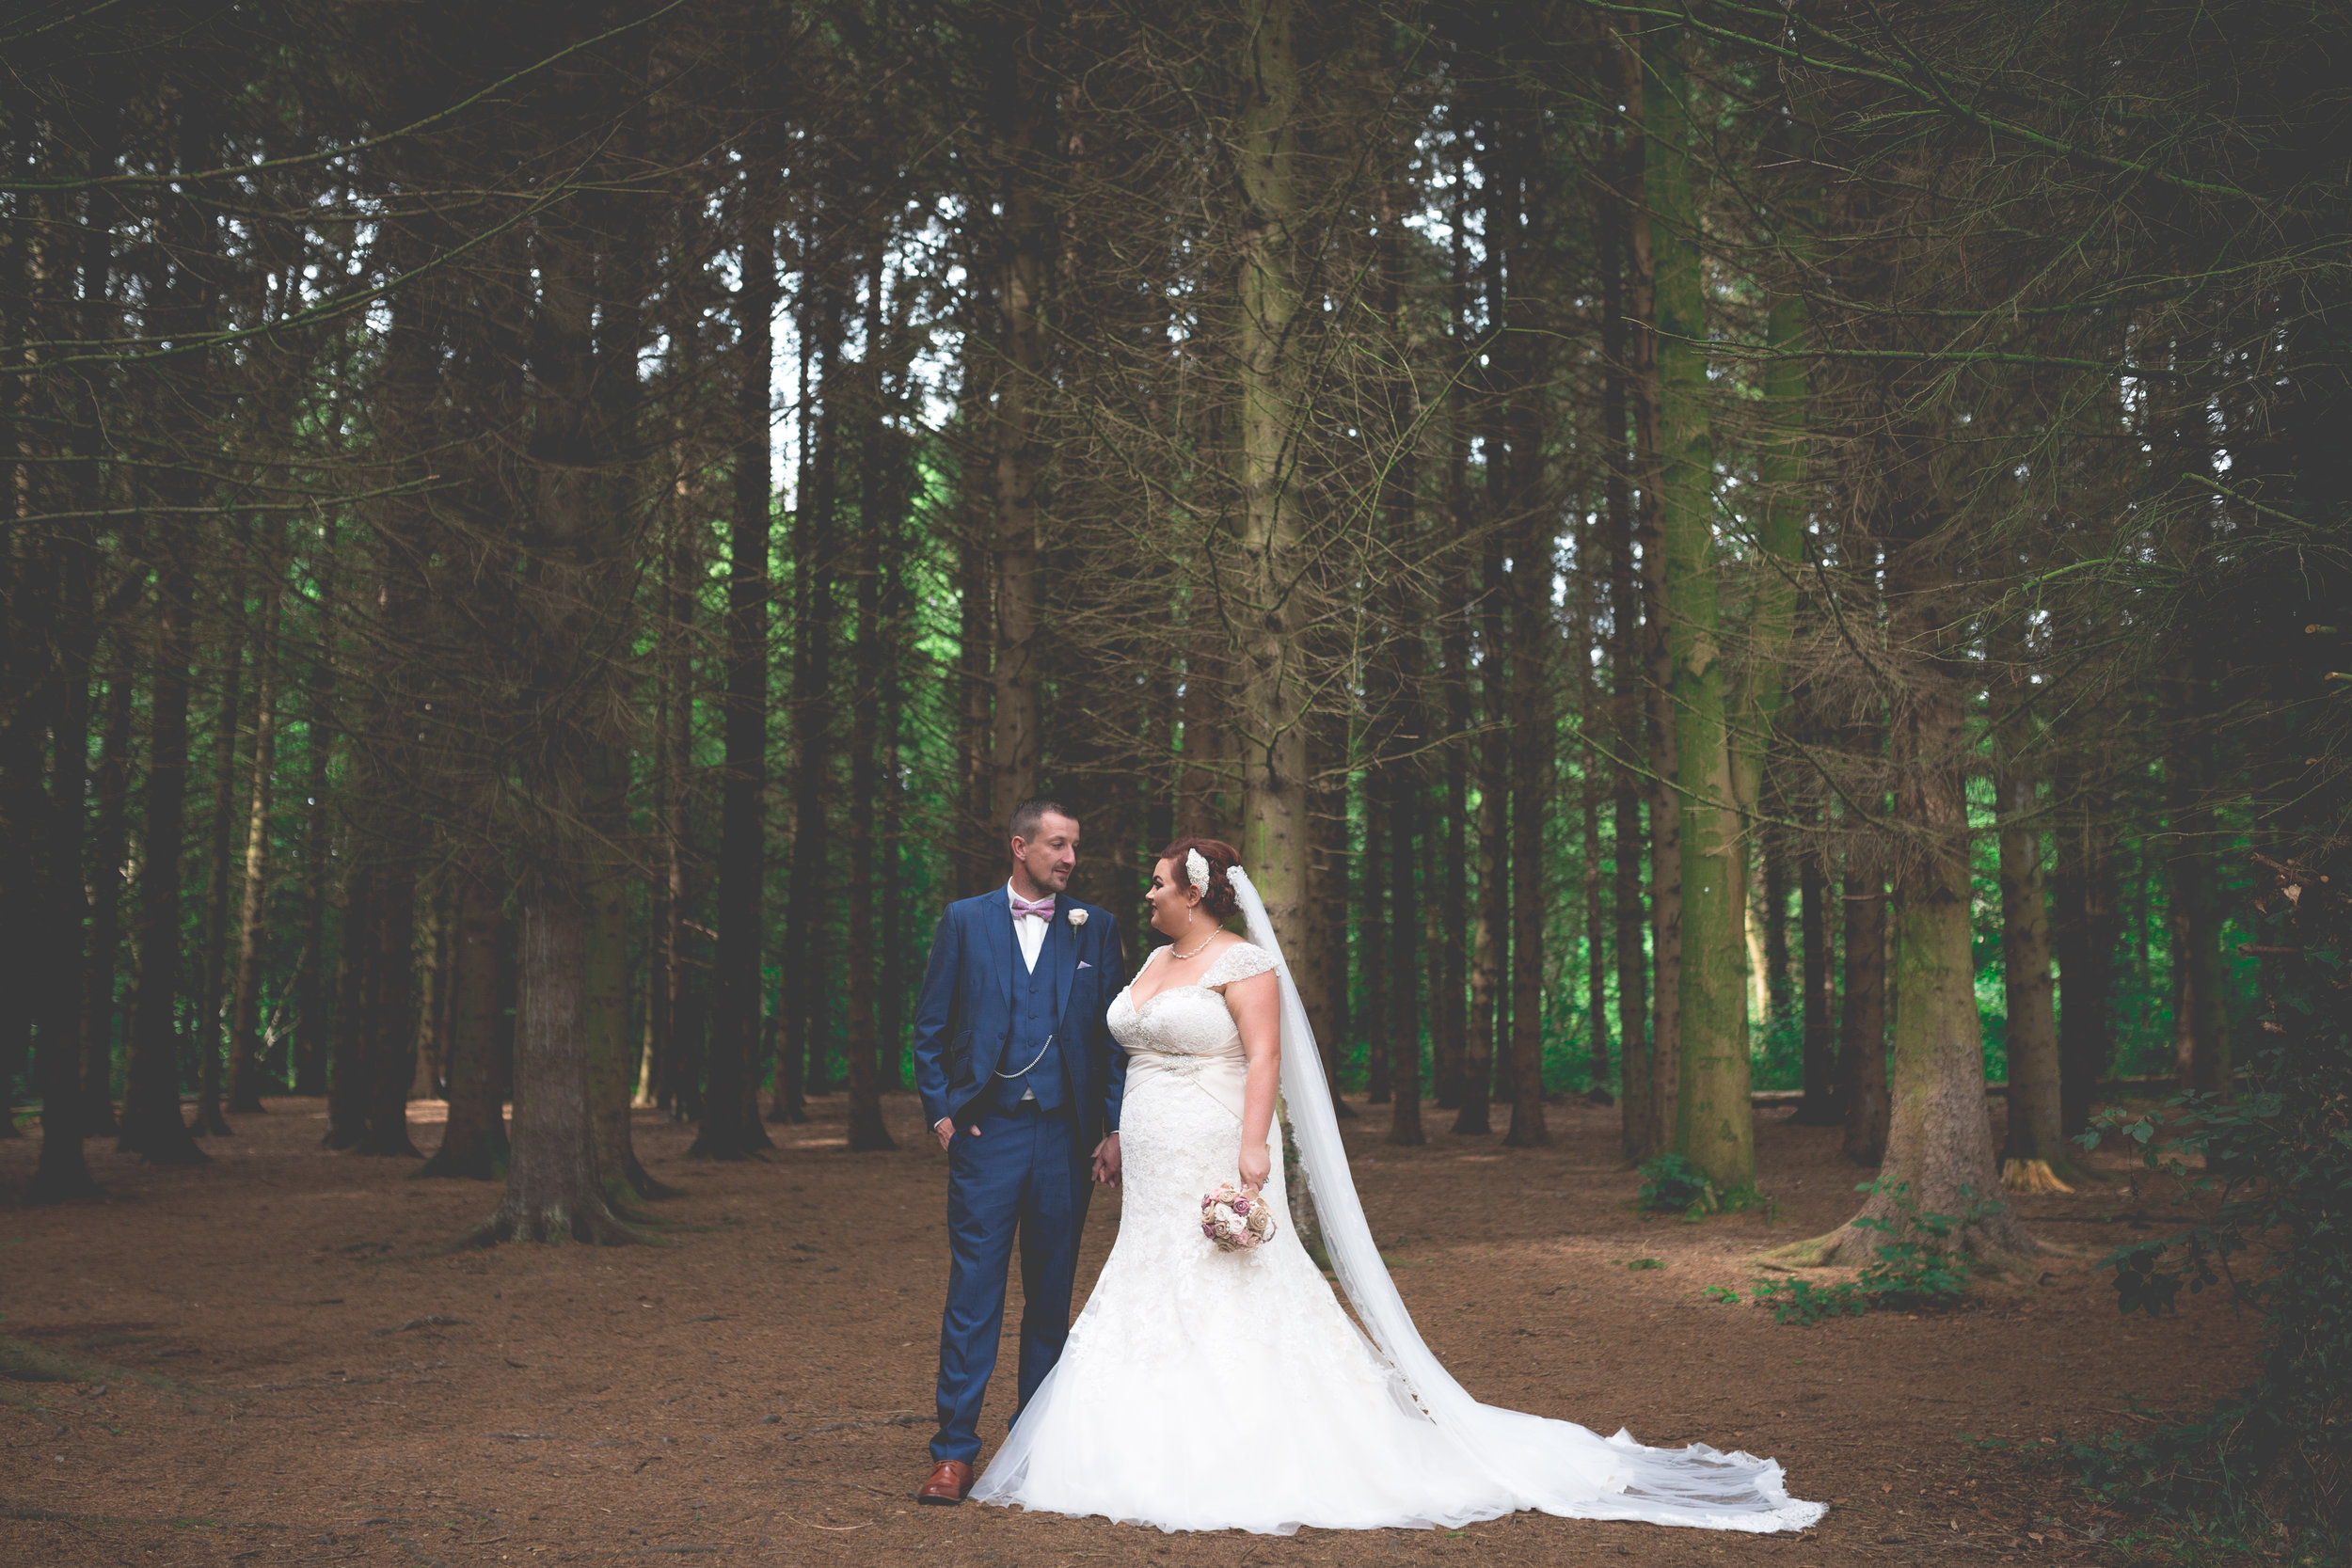 Antoinette & Stephen - Portraits   Brian McEwan Photography   Wedding Photographer Northern Ireland 21.jpg